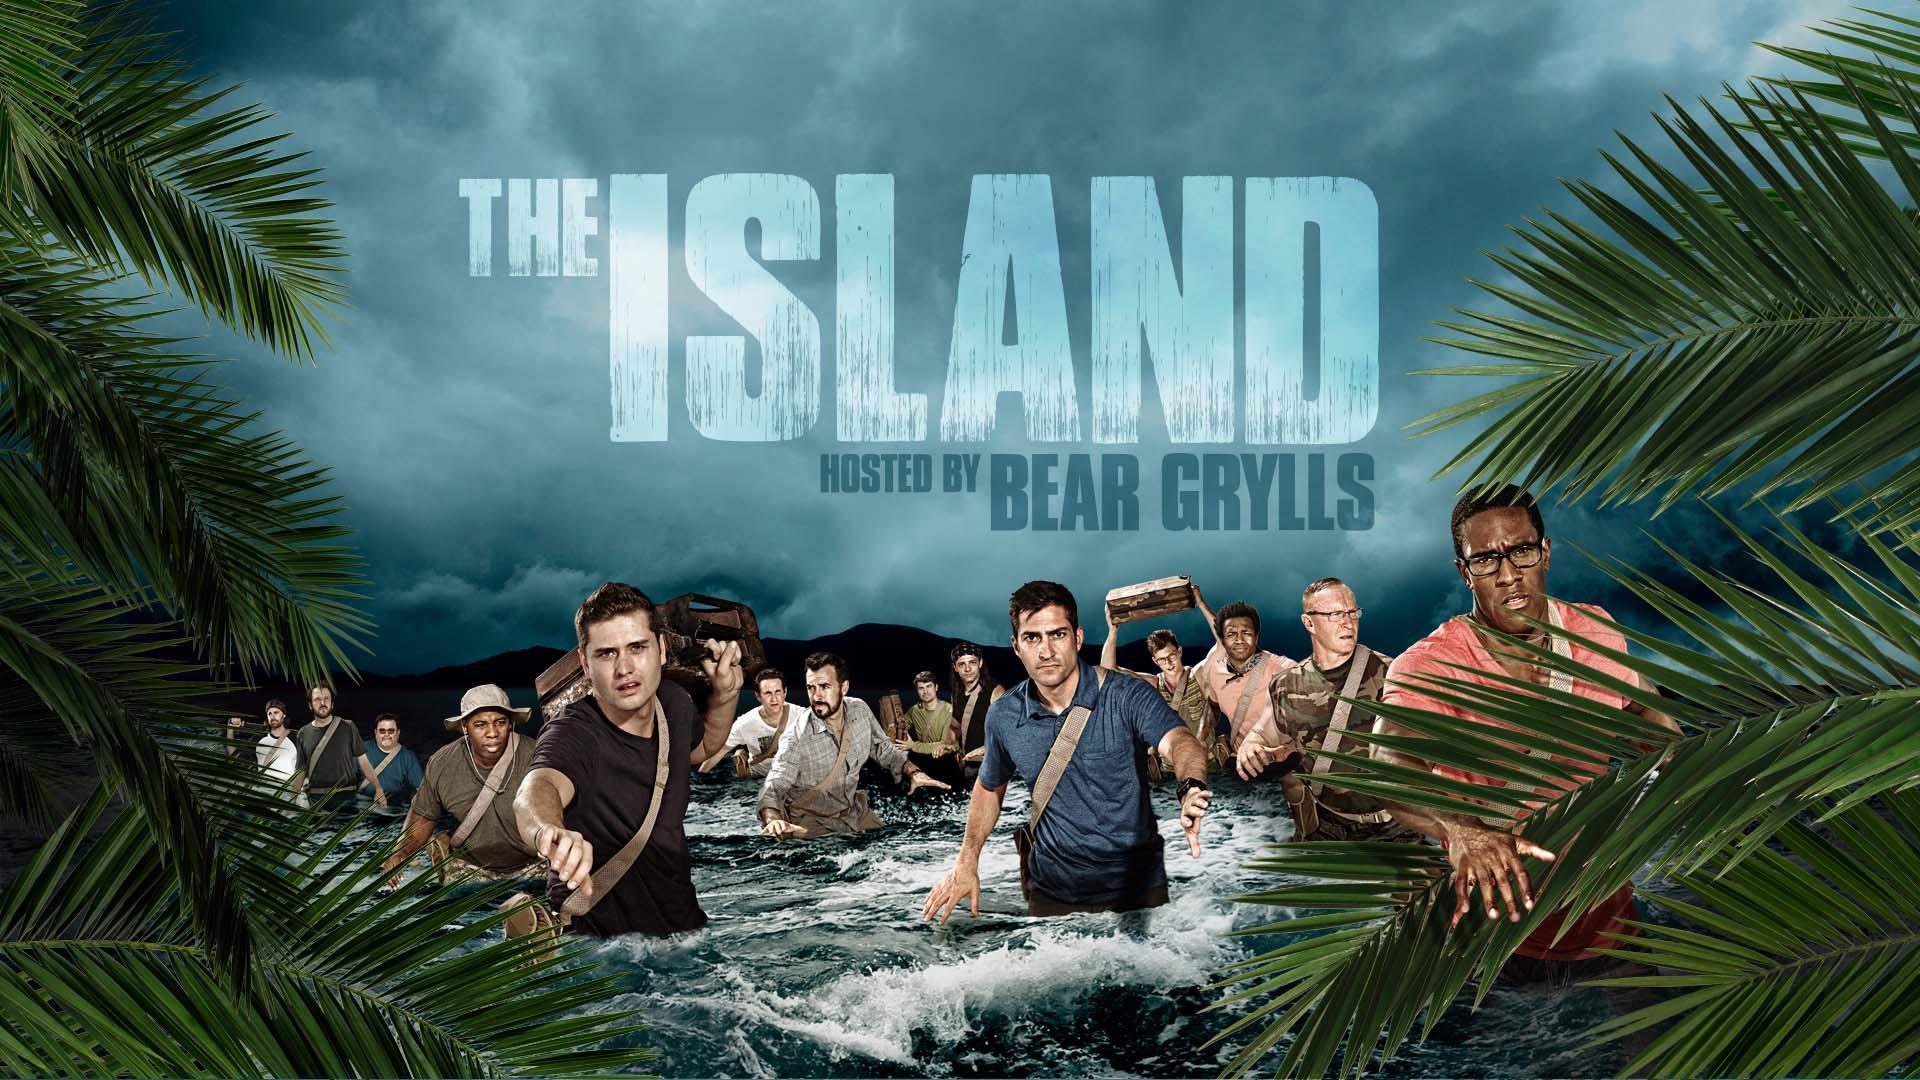 Show The Island with Bear Grylls